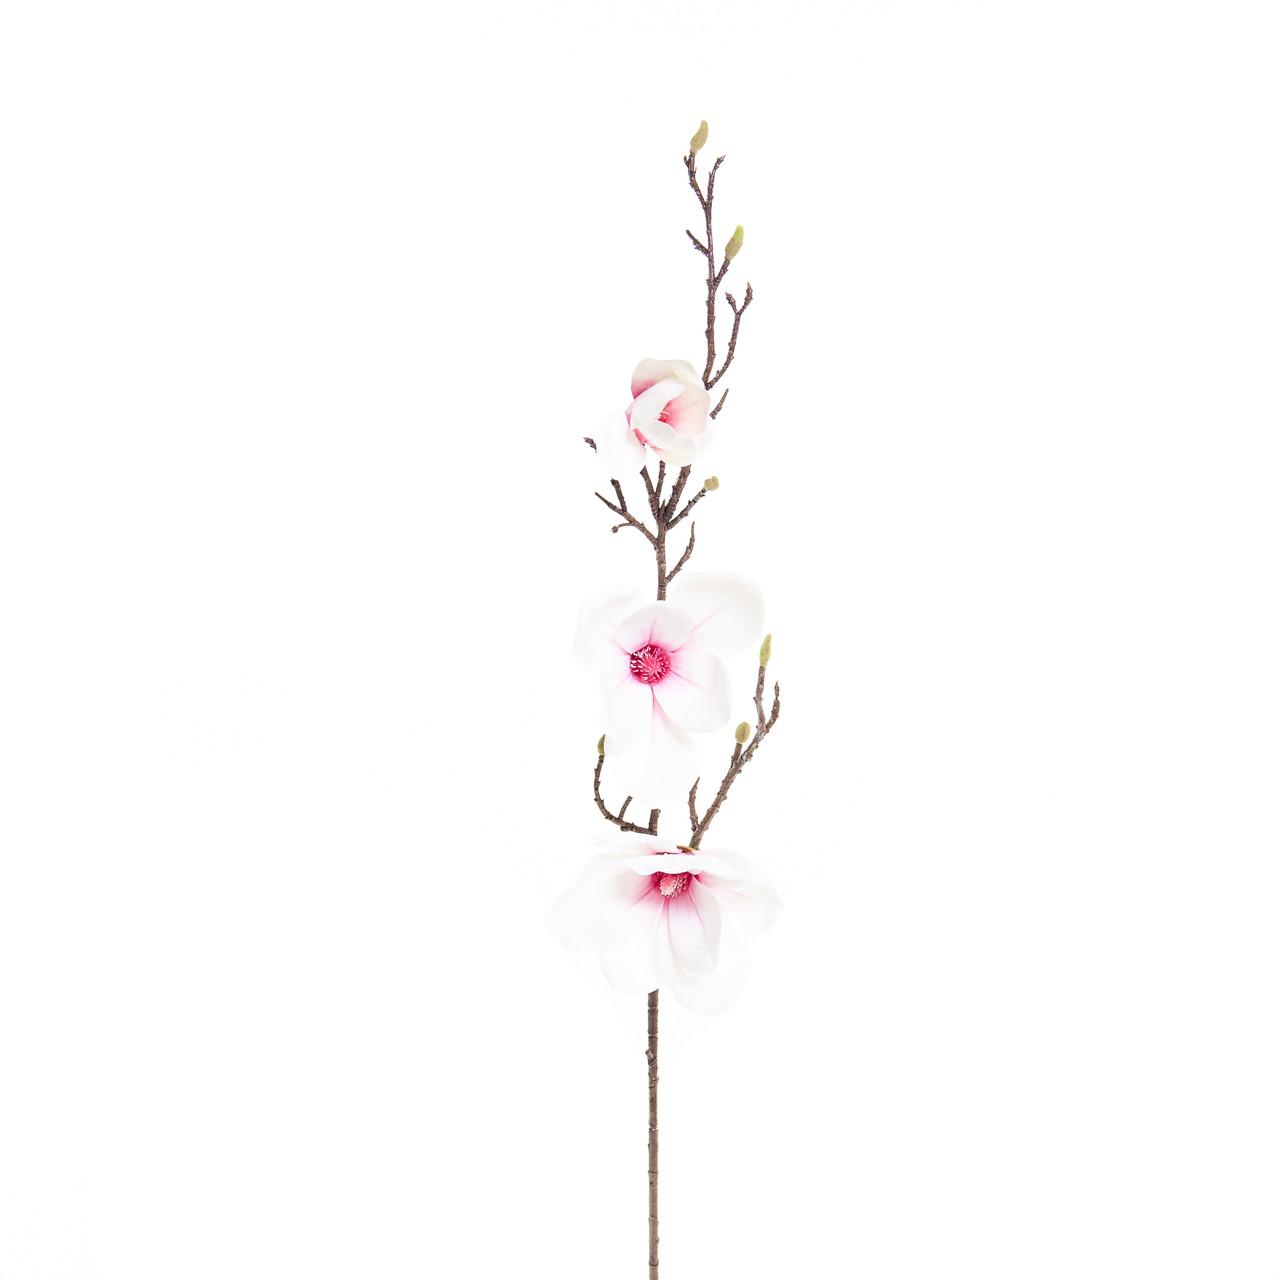 Kunst Magnoliatak 93 cm wit/roze